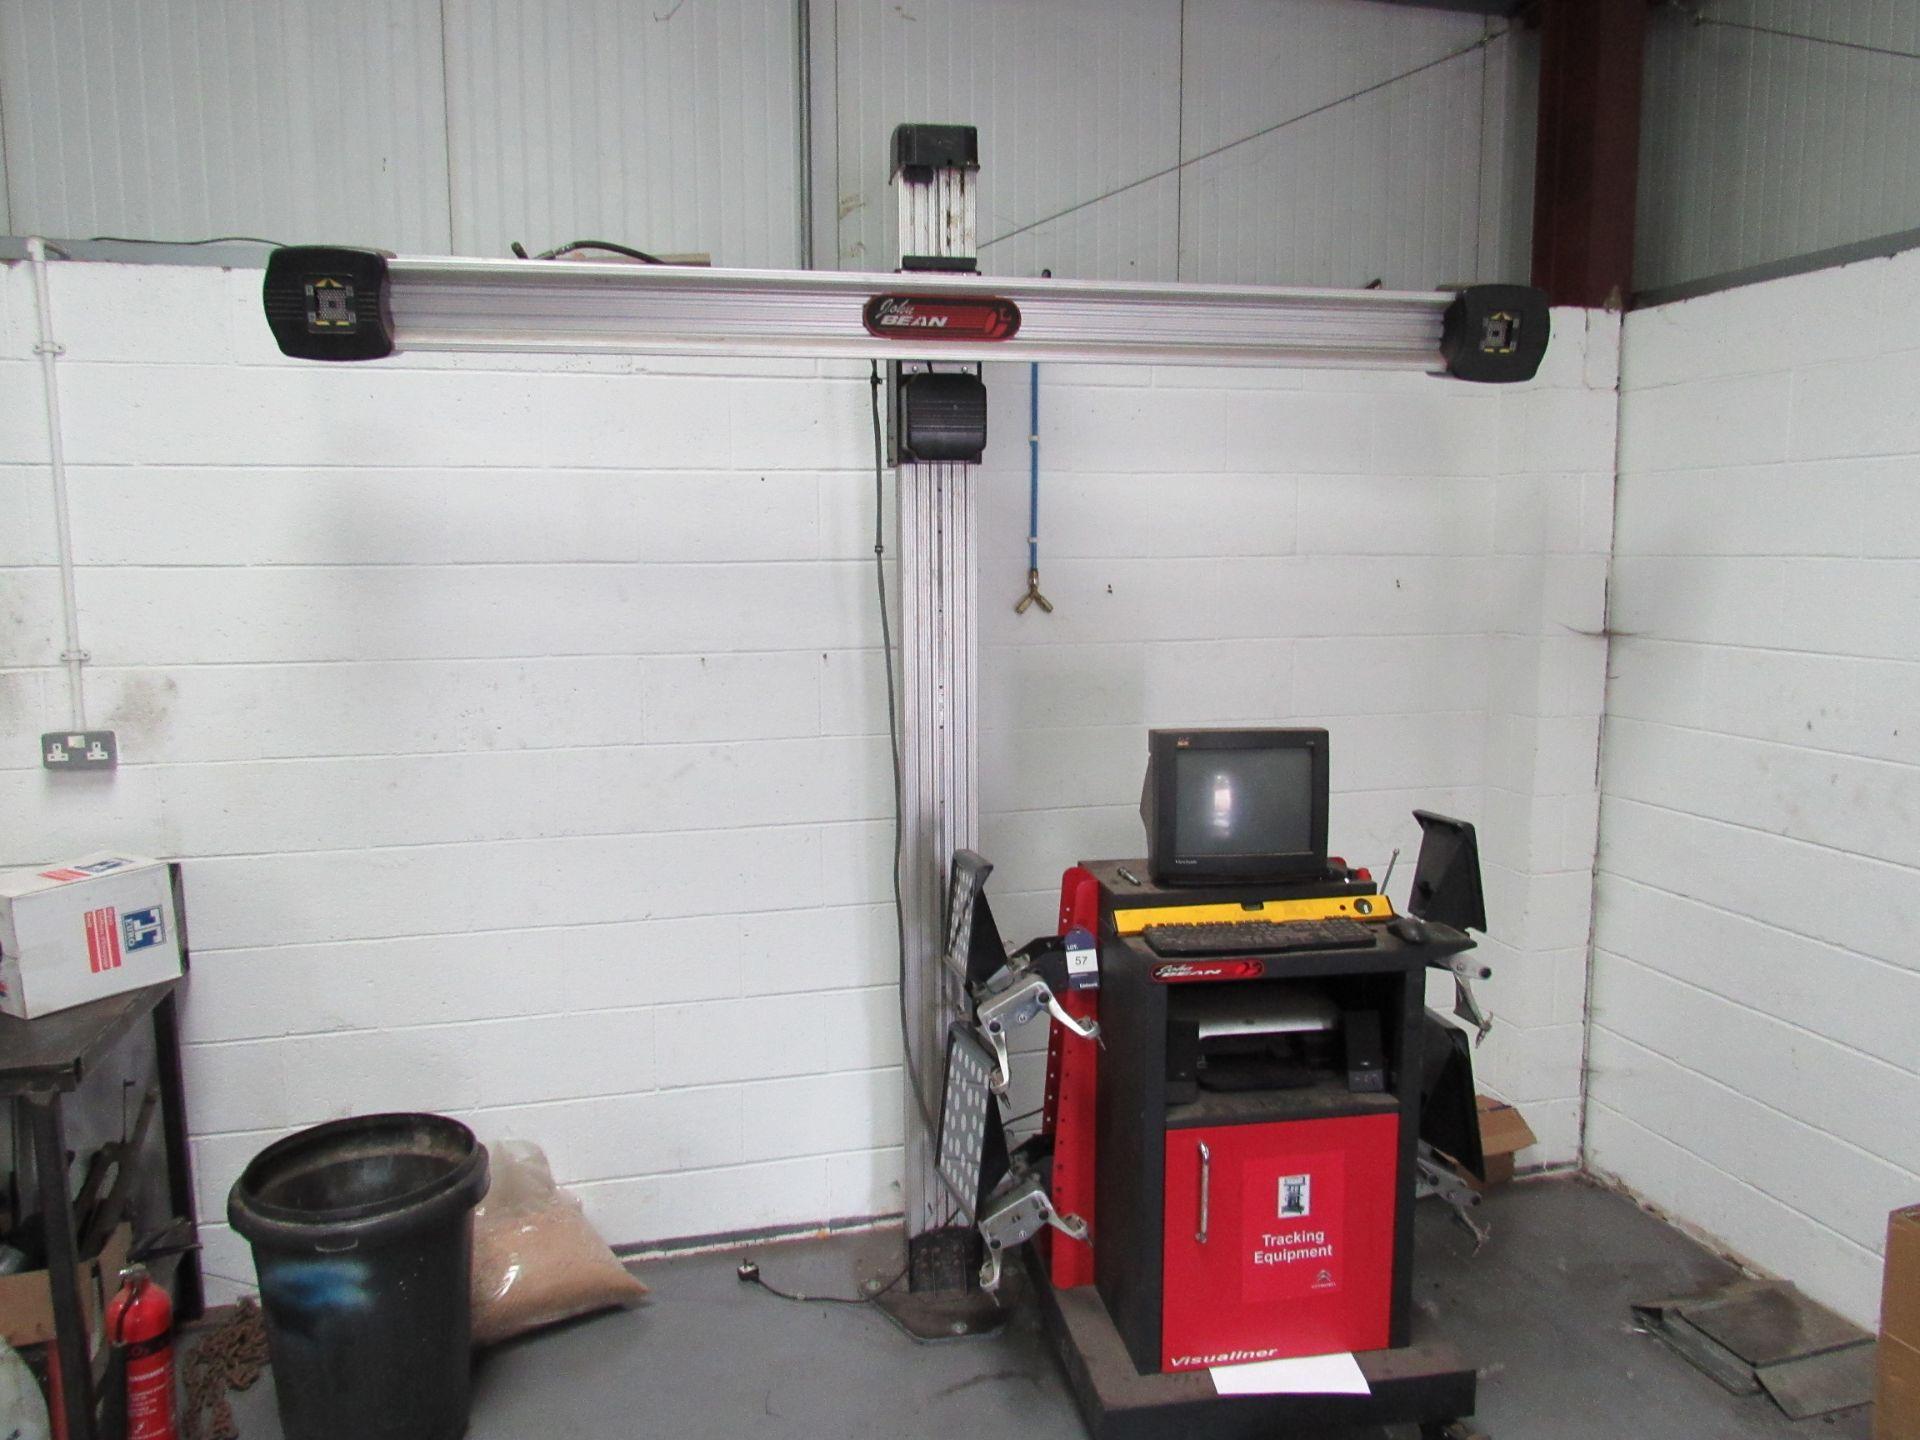 Lot 57 - John Bean Visualiner Tracking System/Wheel Aligner, Model EEWA544A (Located at Unit 11)